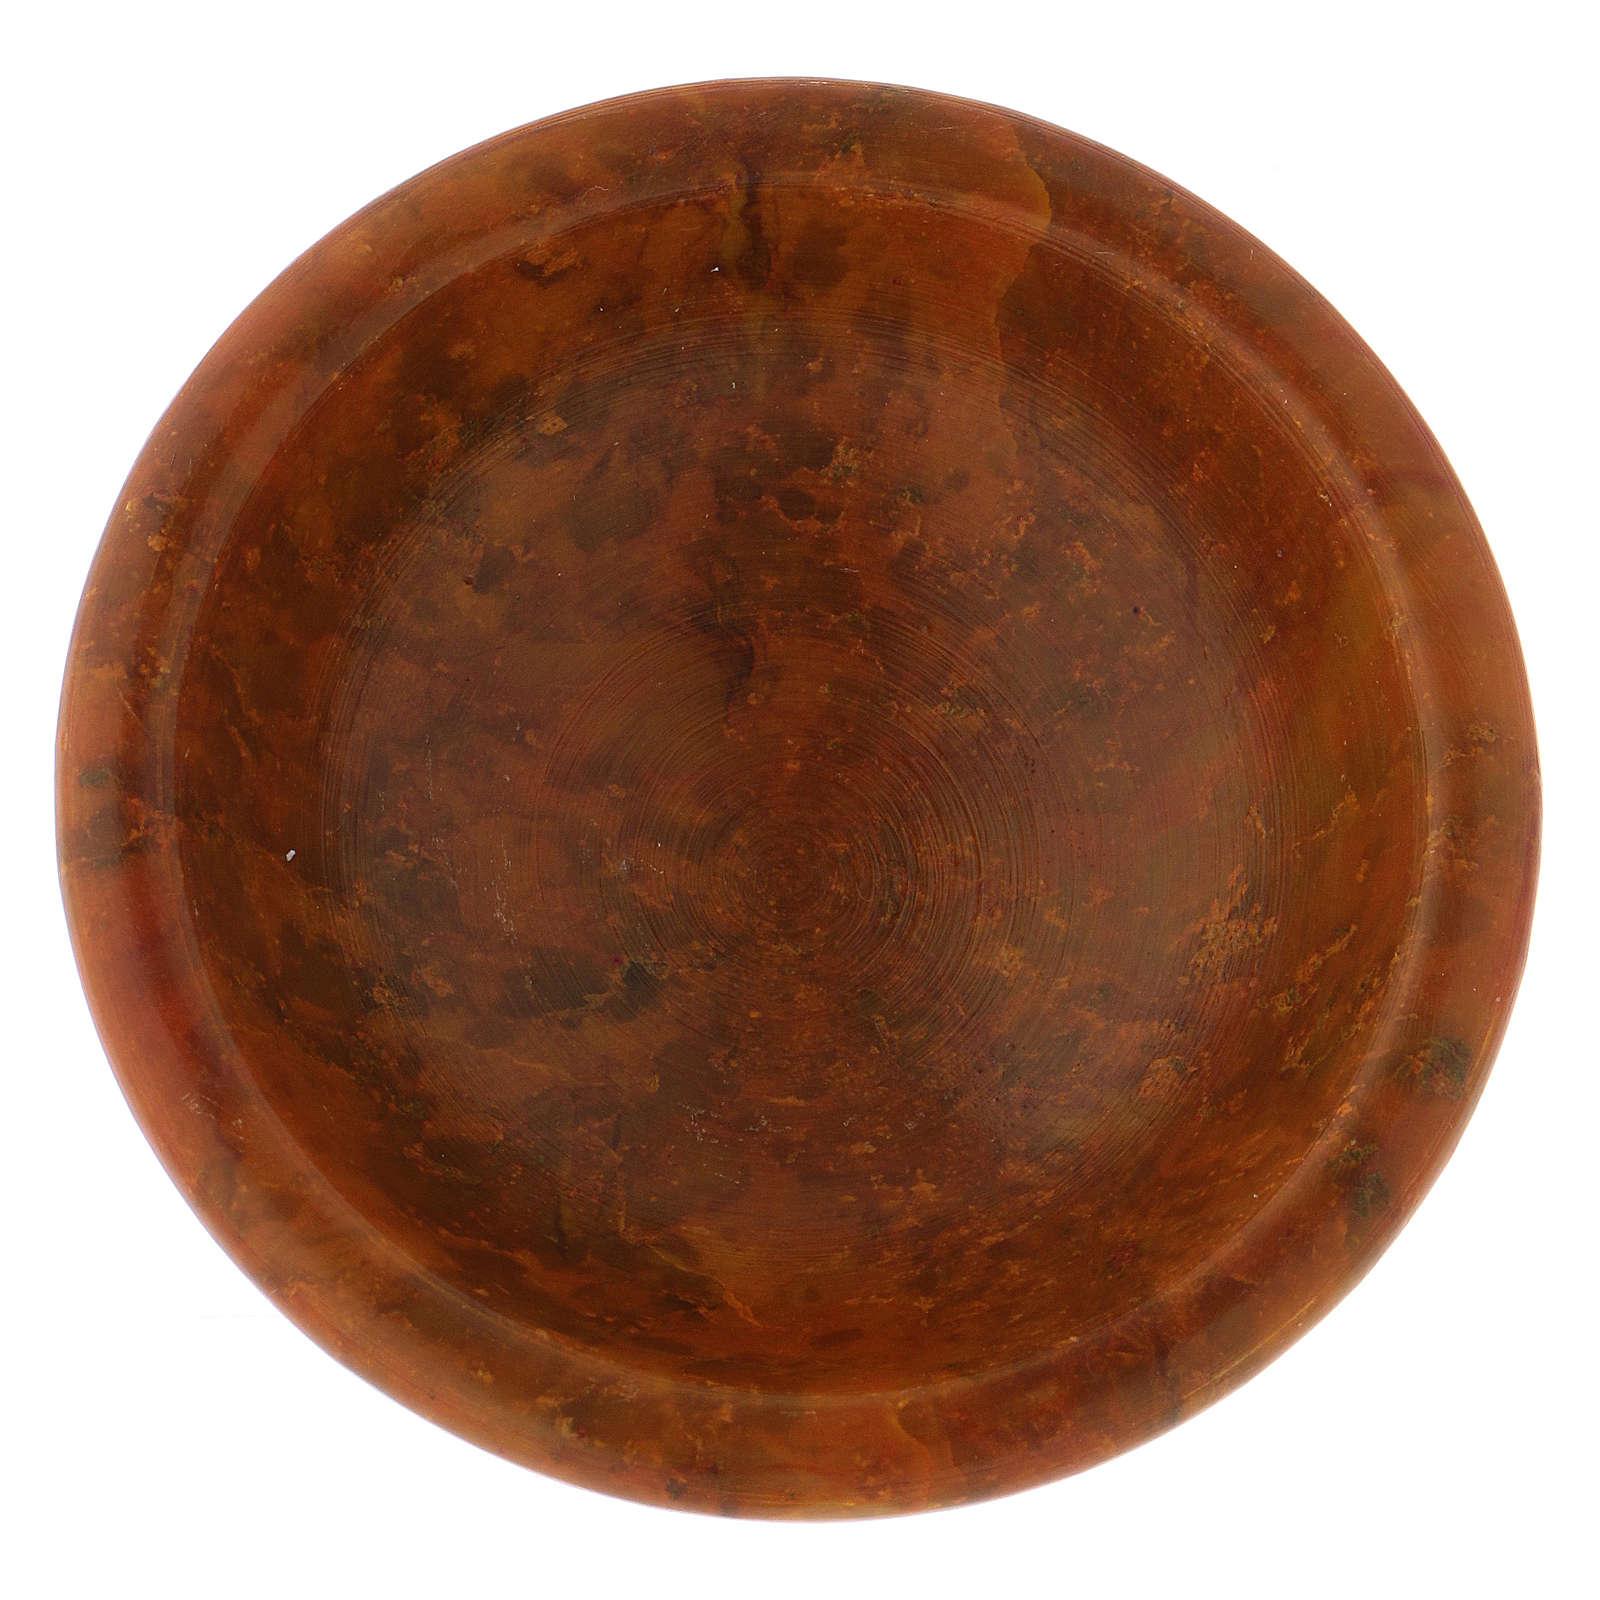 Tigela porta incenso cor âmbar diâmetro 8 cm 3